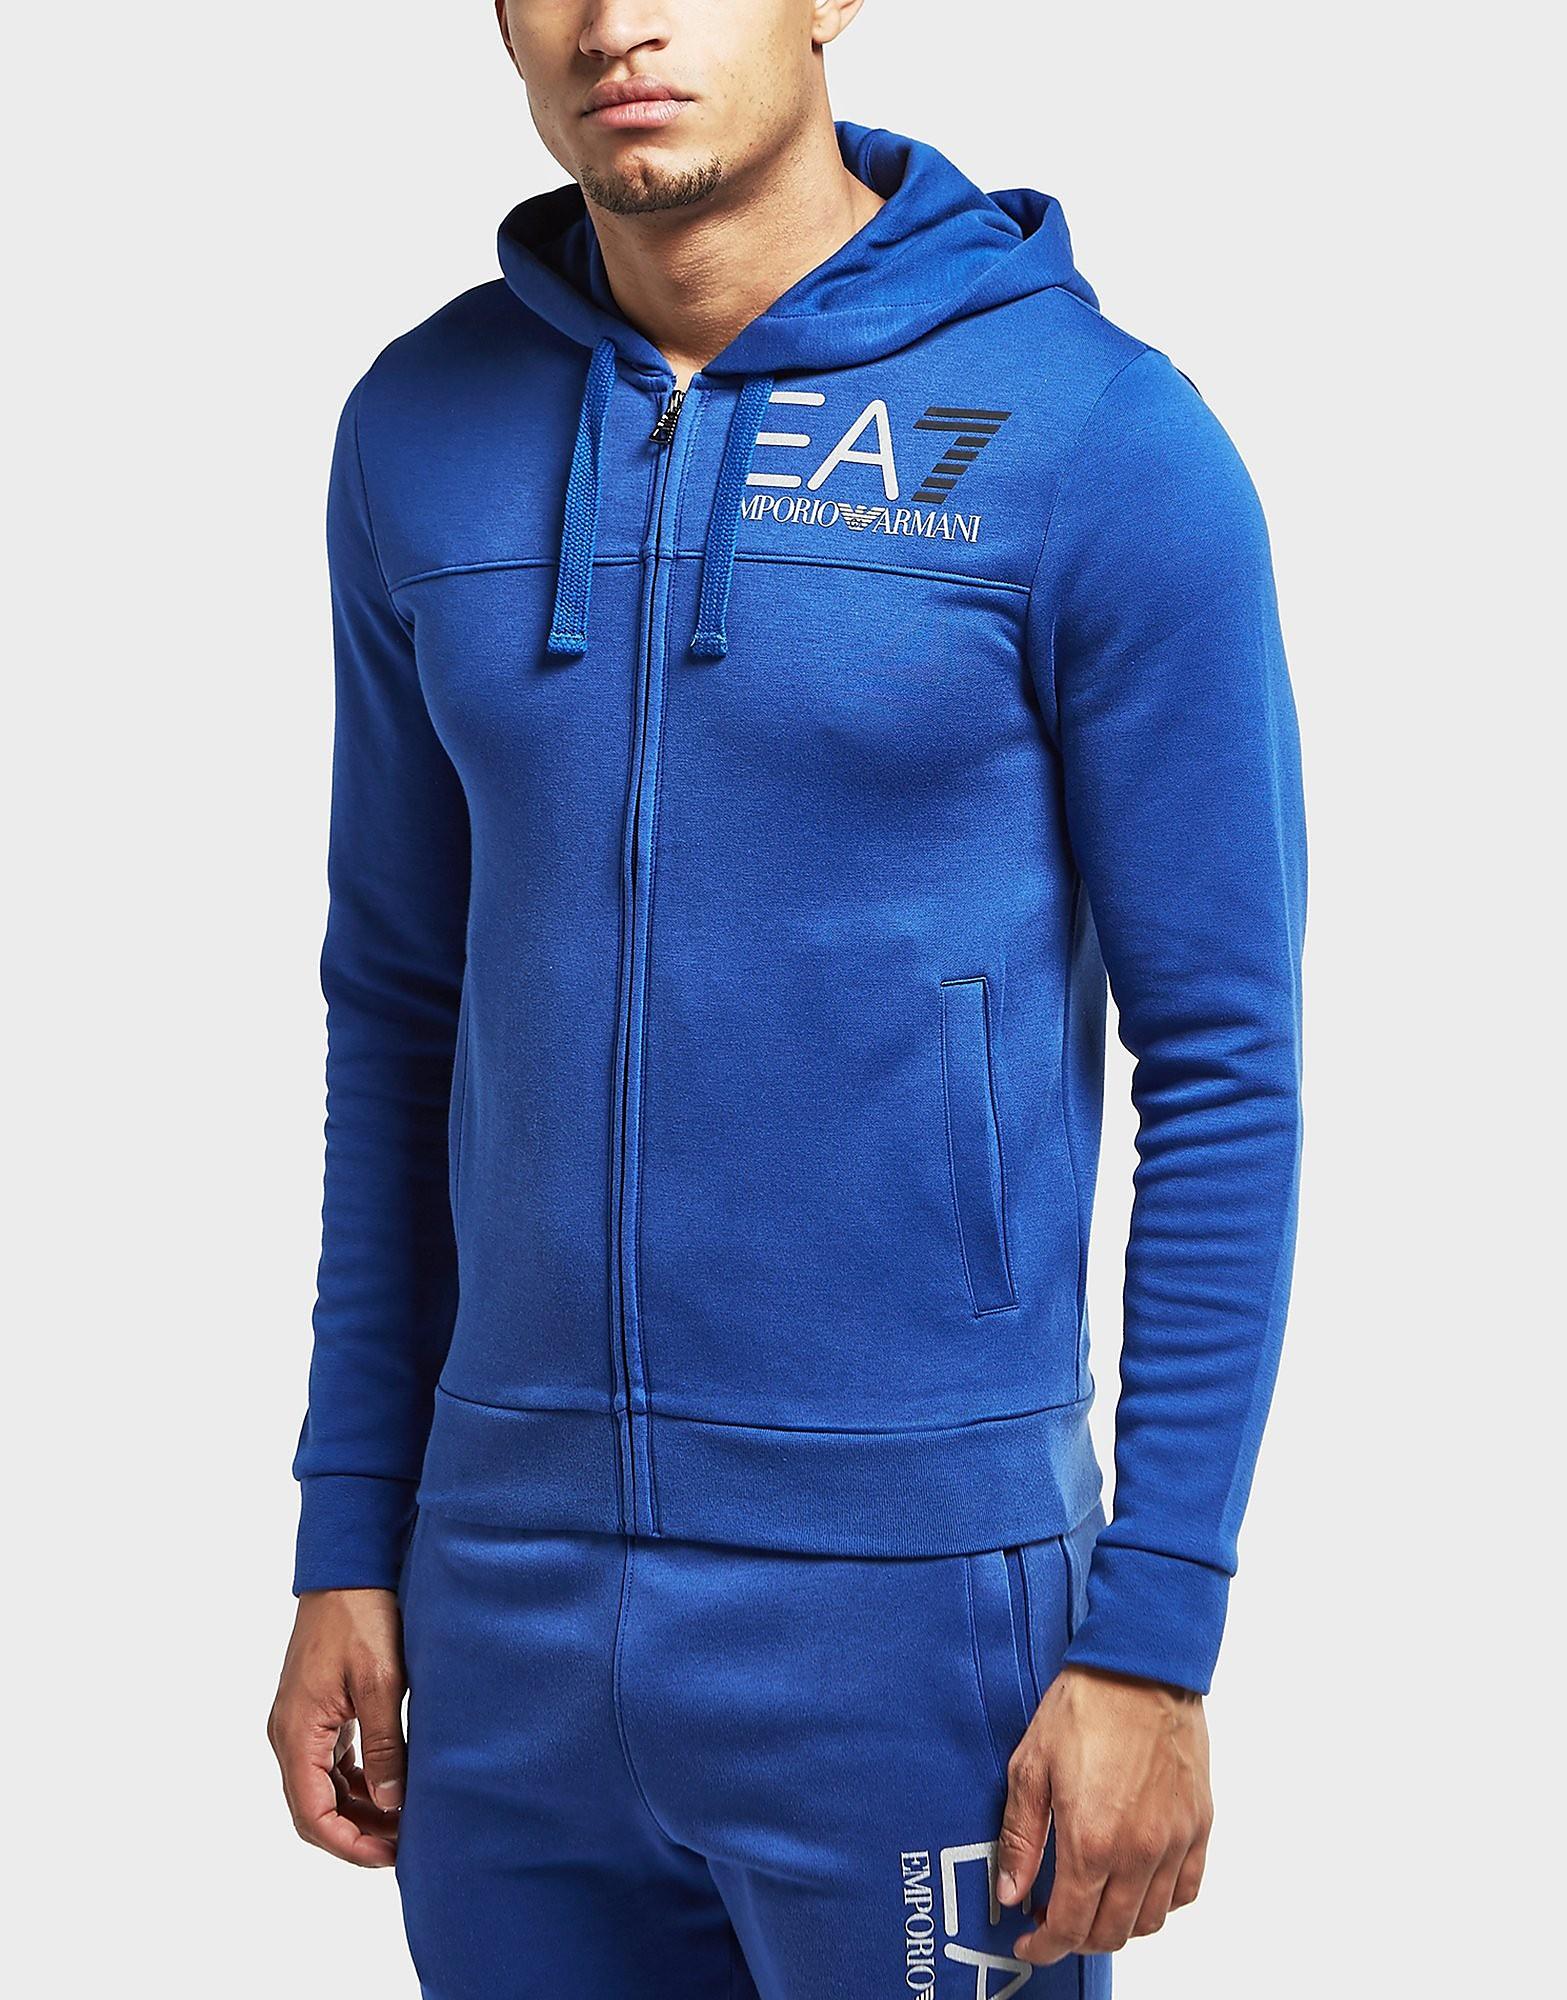 Emporio Armani EA7 Logo Full Zip Hoody